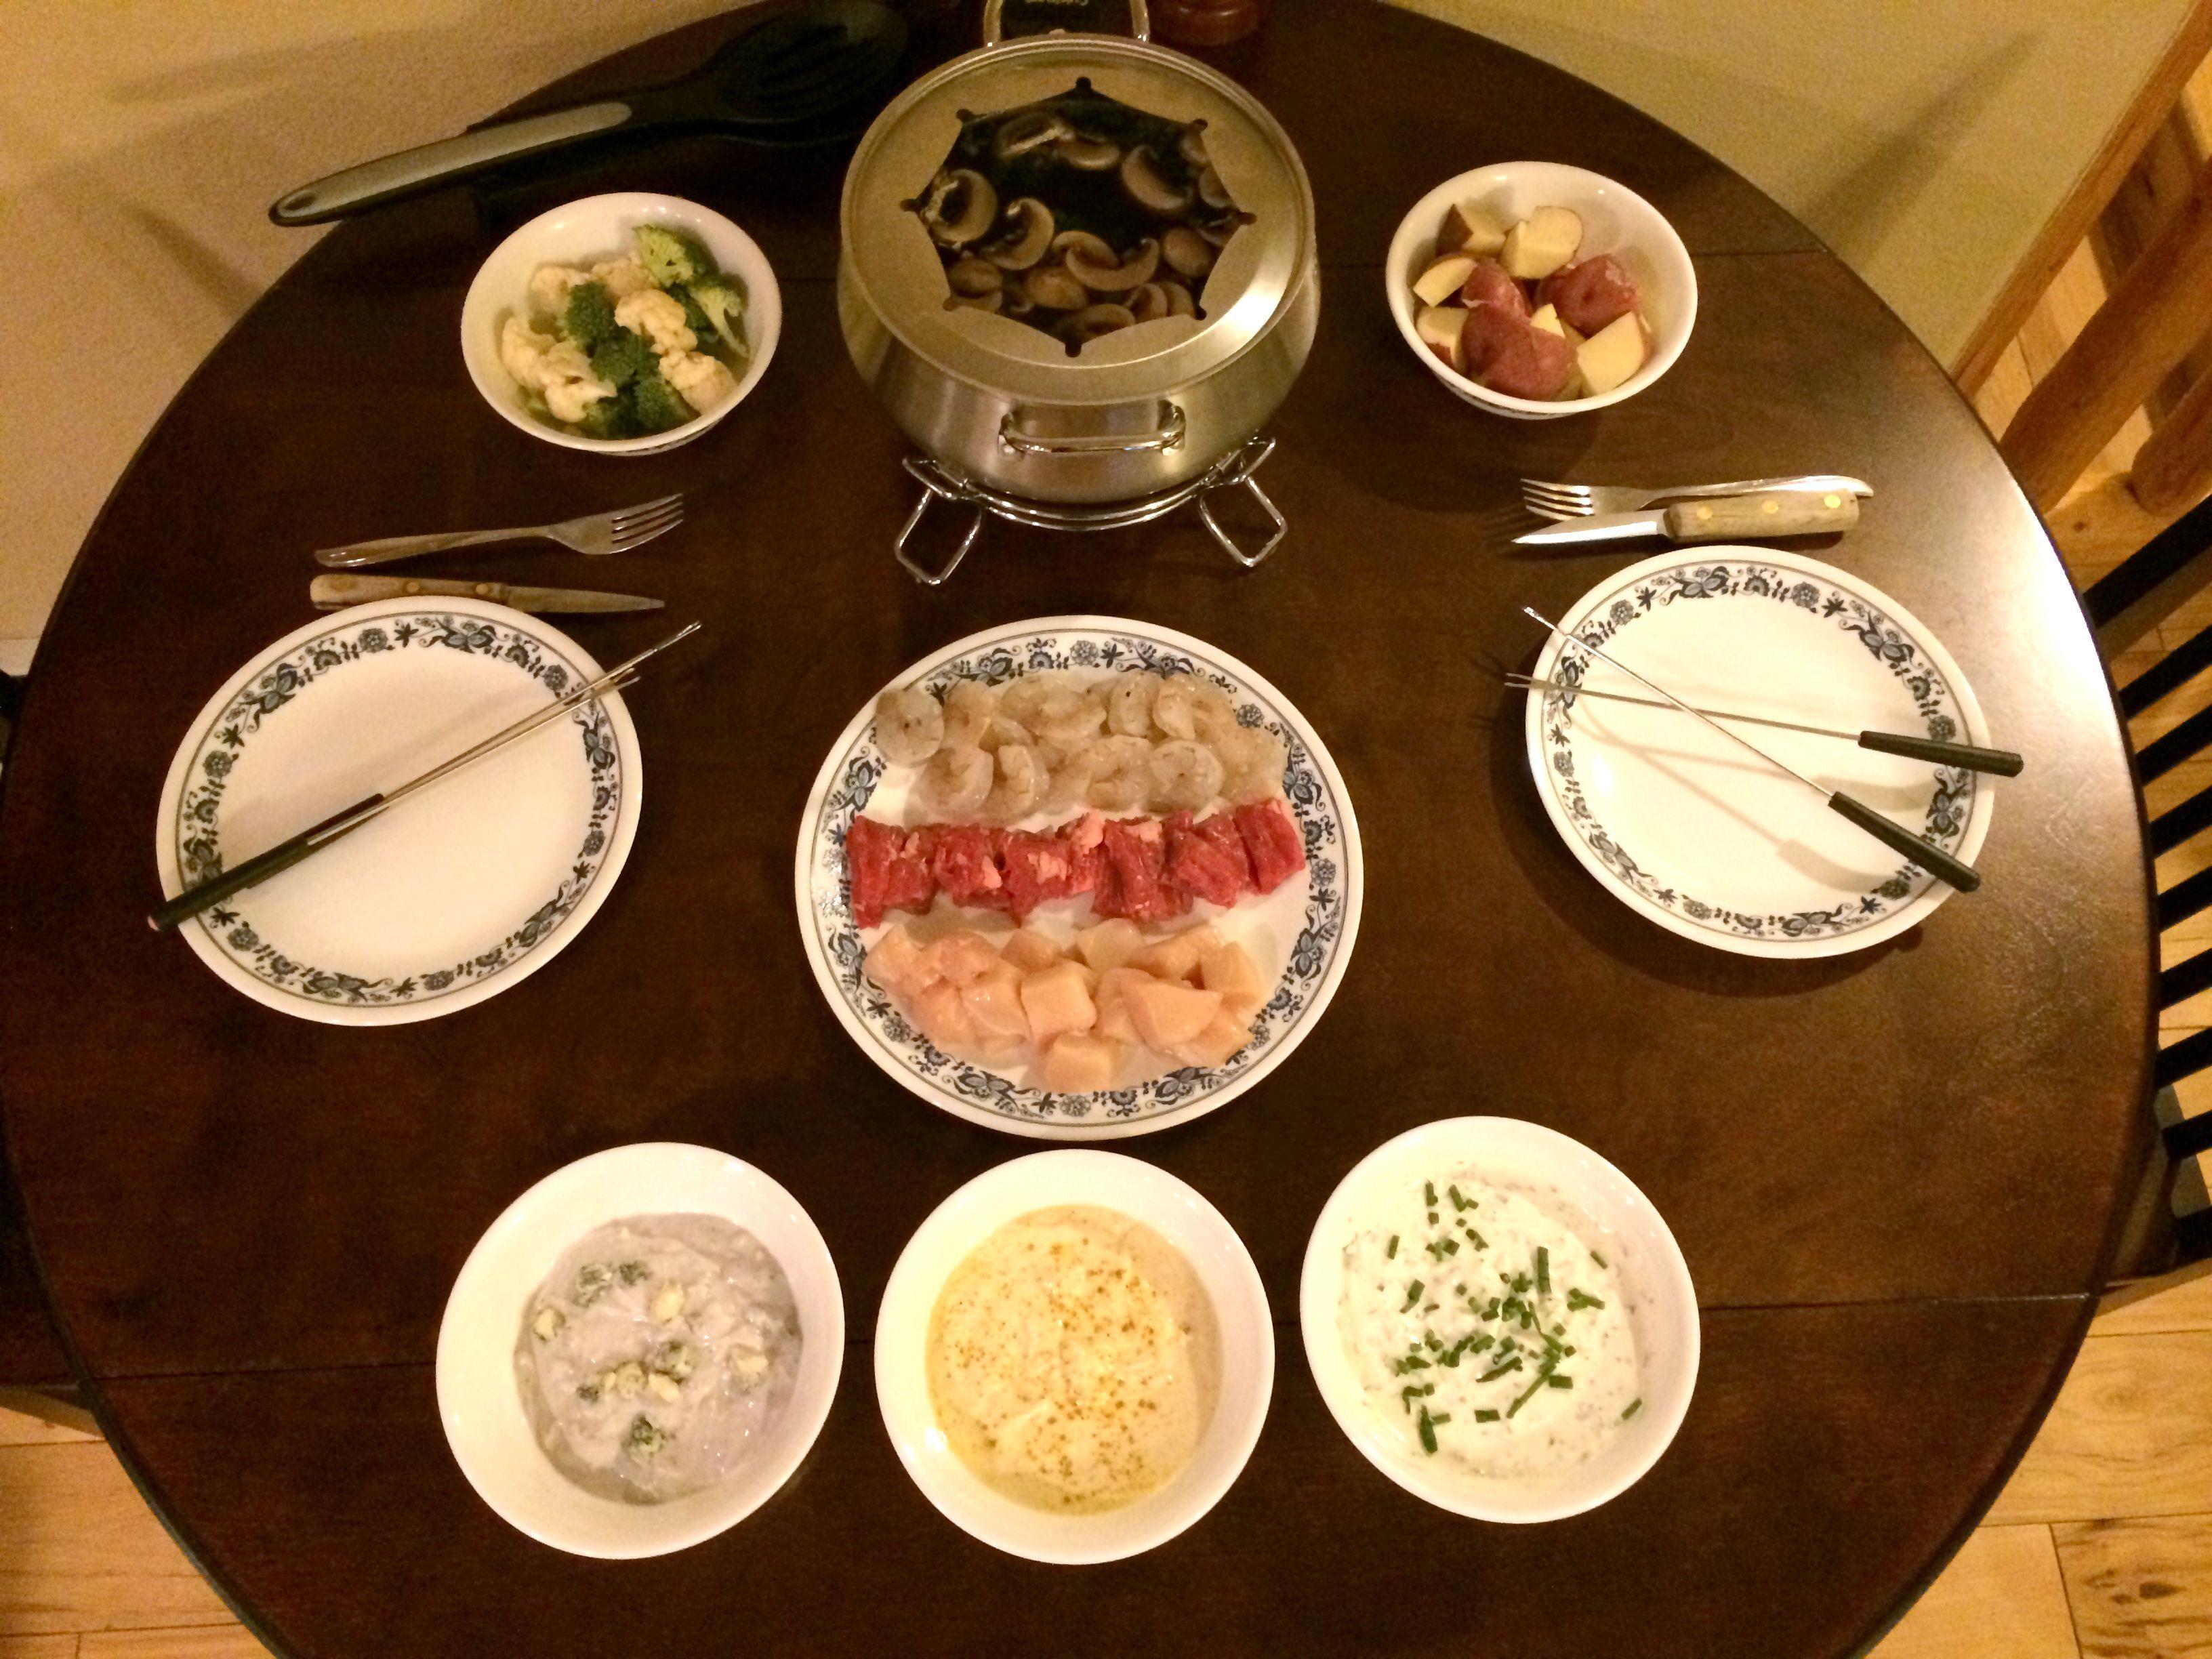 Fondue Cooking Broth With Meats Veggies Dipping Sauces Gf Recipe Cooking Broth Fondue Recipes Meat Fondue Recipes